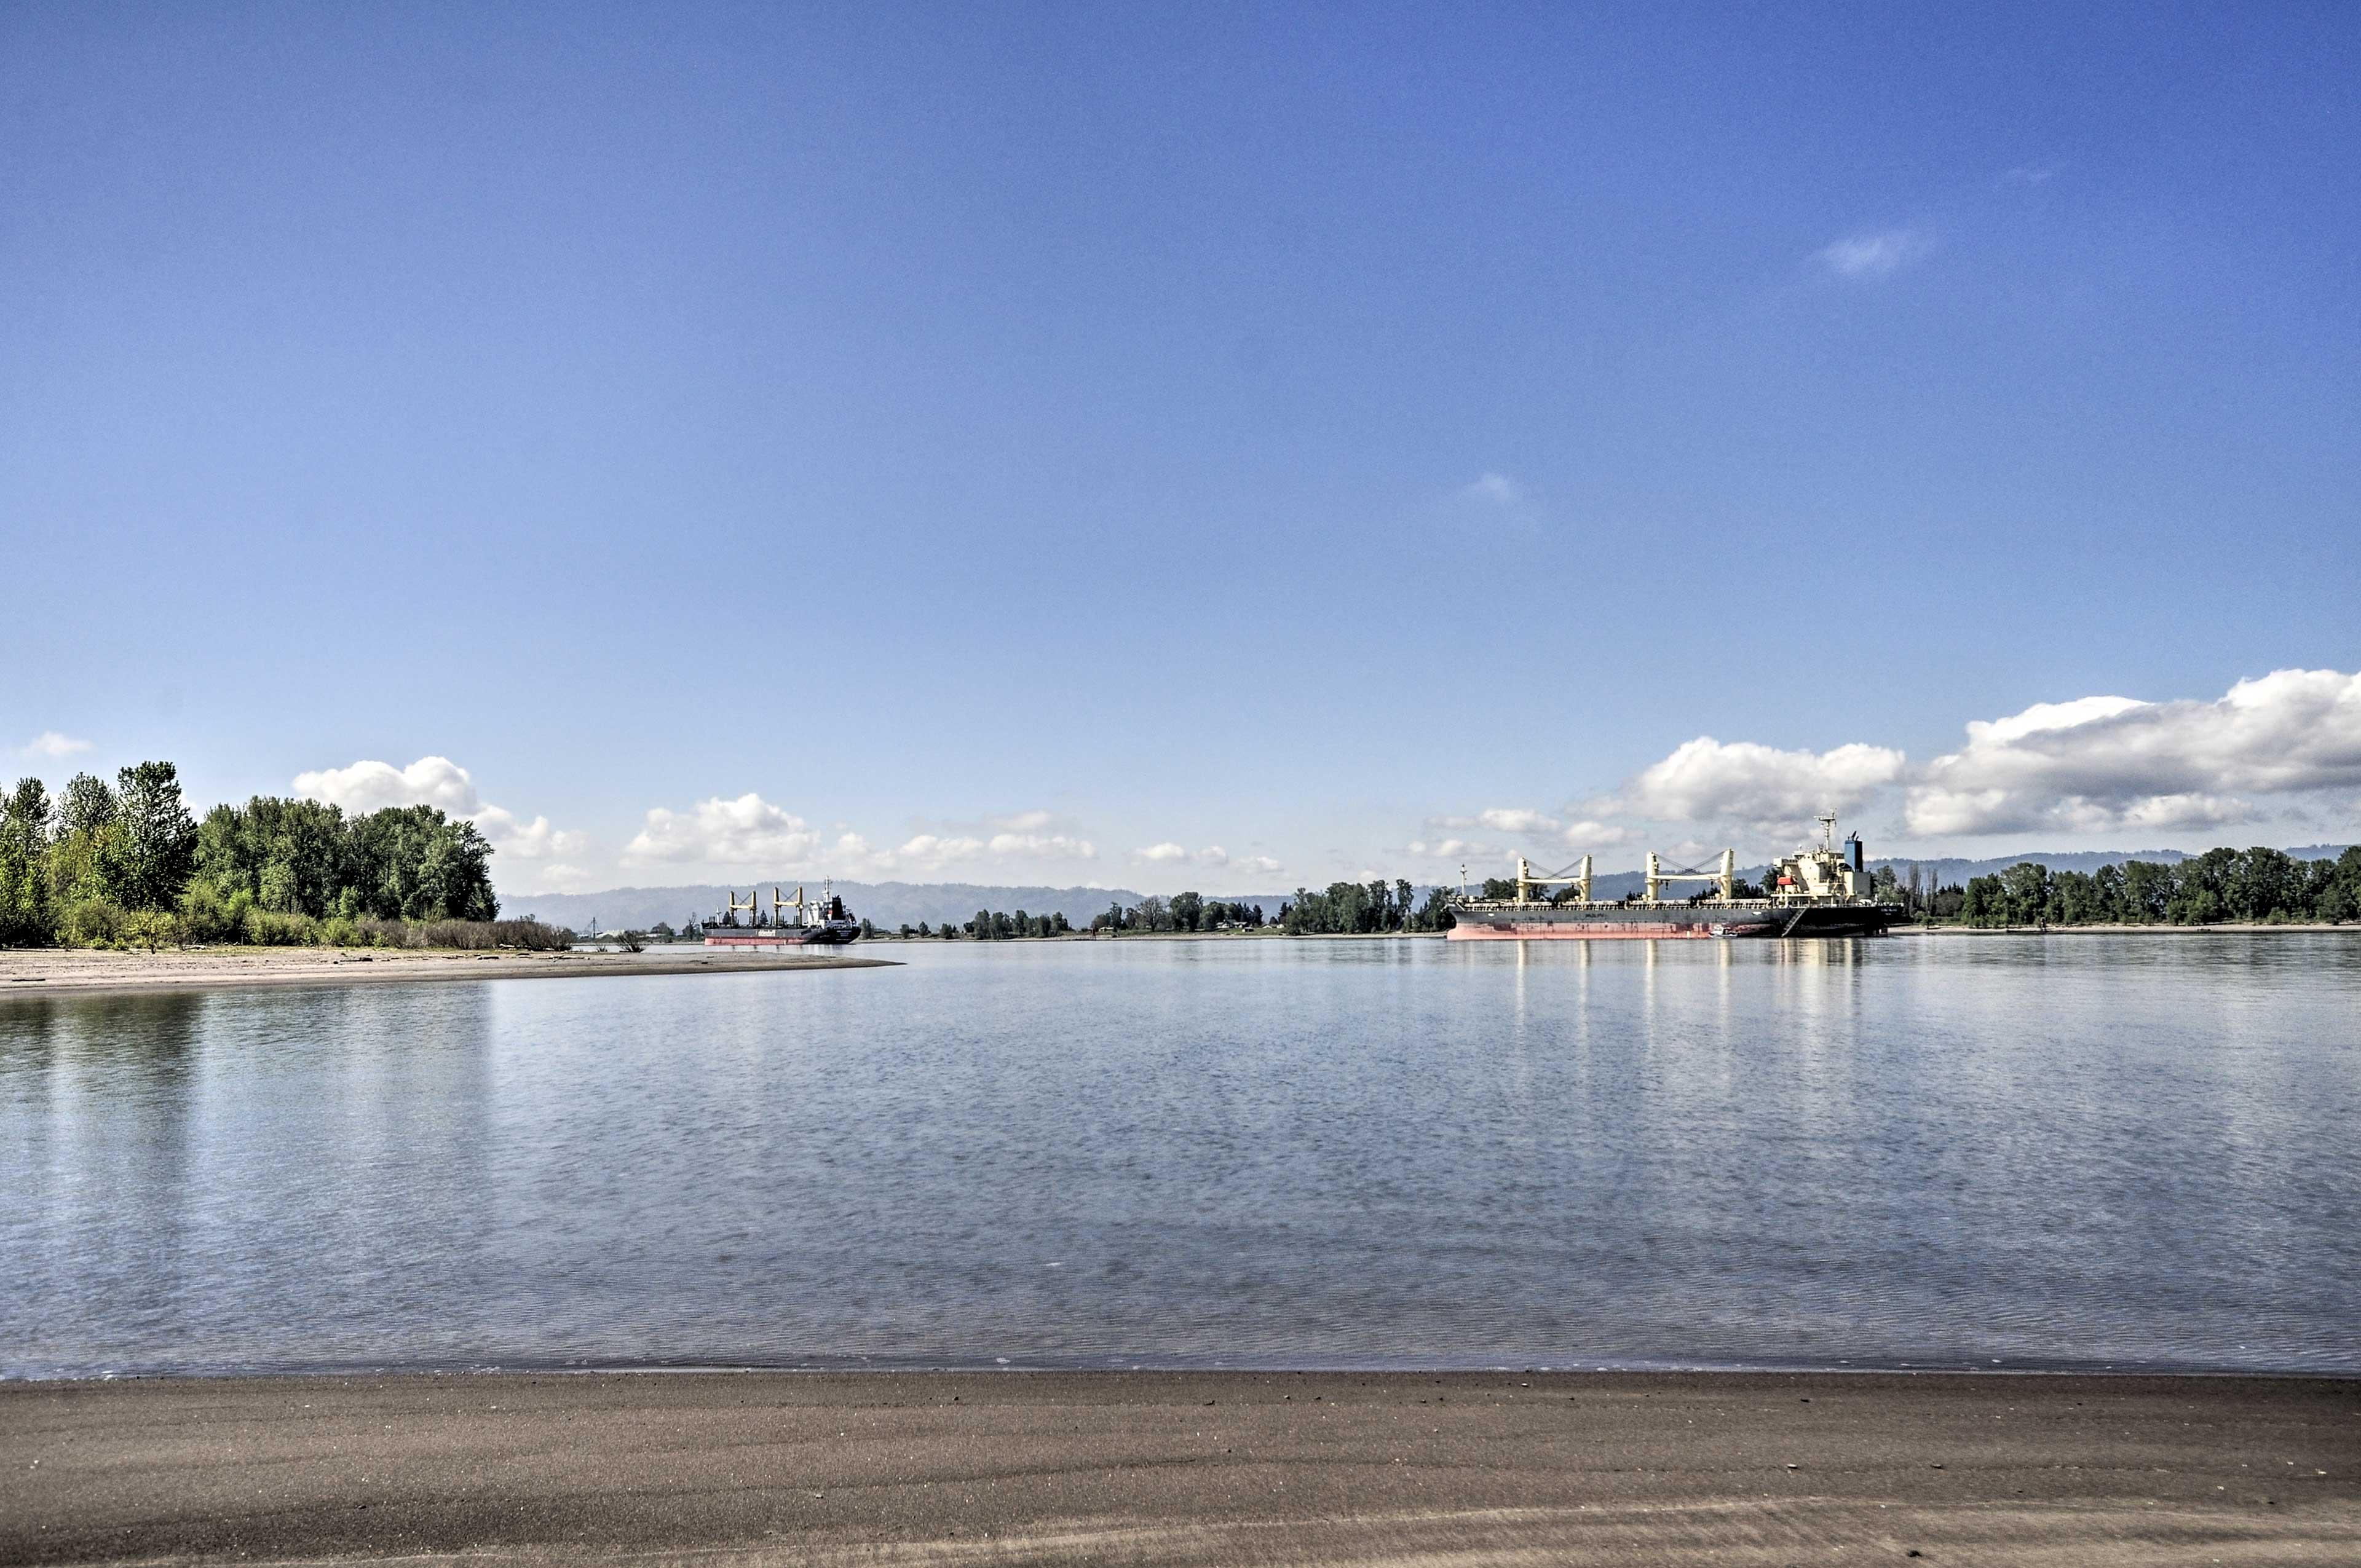 Kids will love splashing around on Caterpillar Island's sandy shoreline!